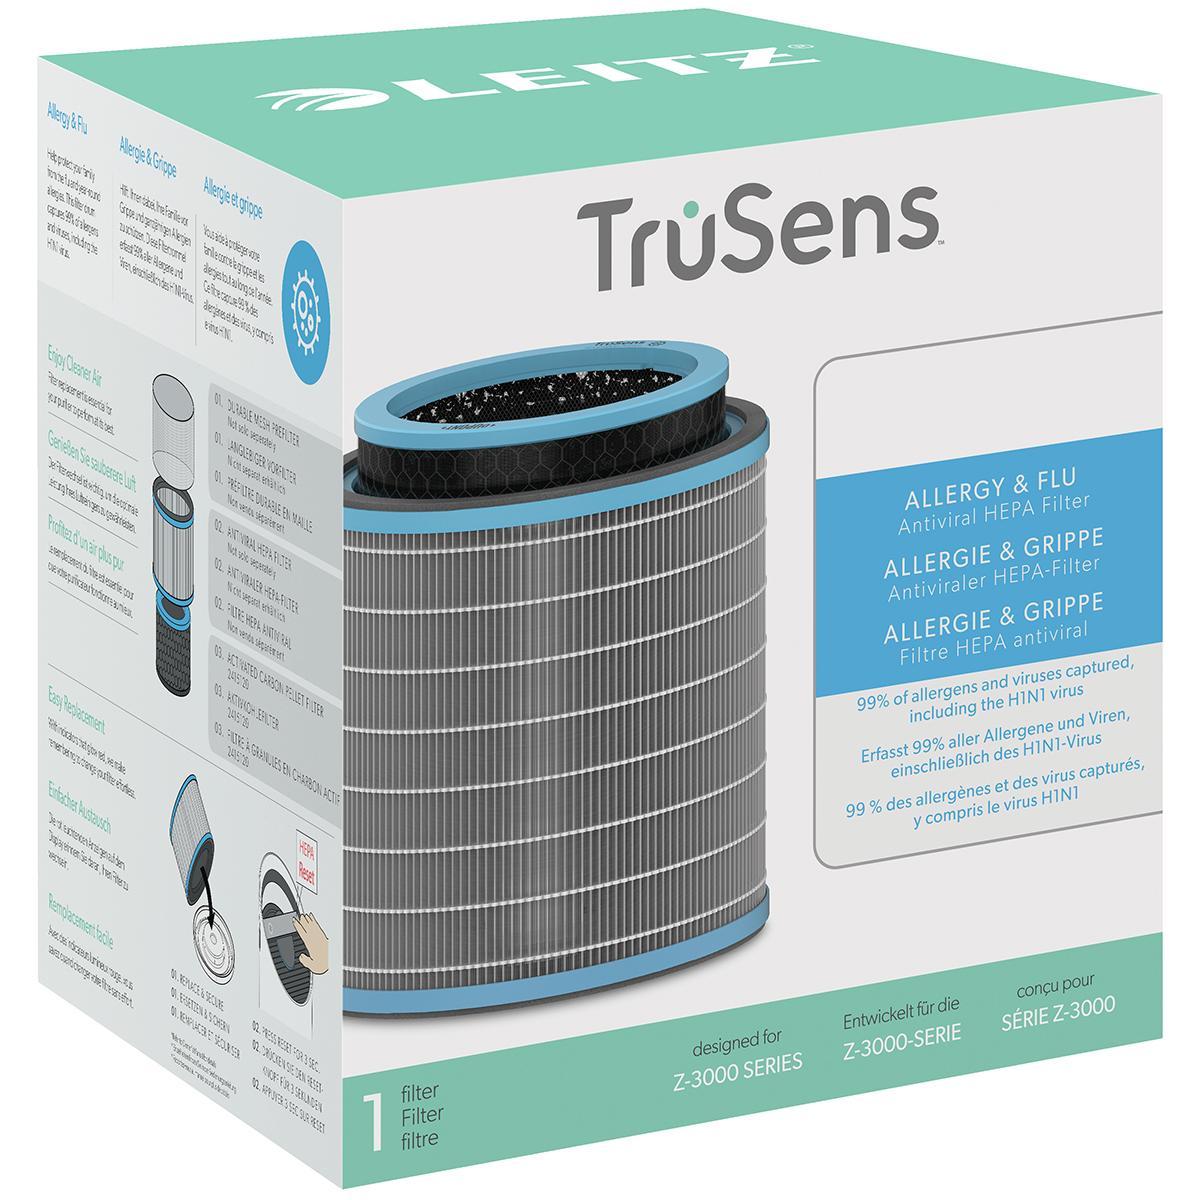 Leitz TruSens Z-3000 Allergy and Flu Anti-viral 3-in-1 HEPA Filter Drum